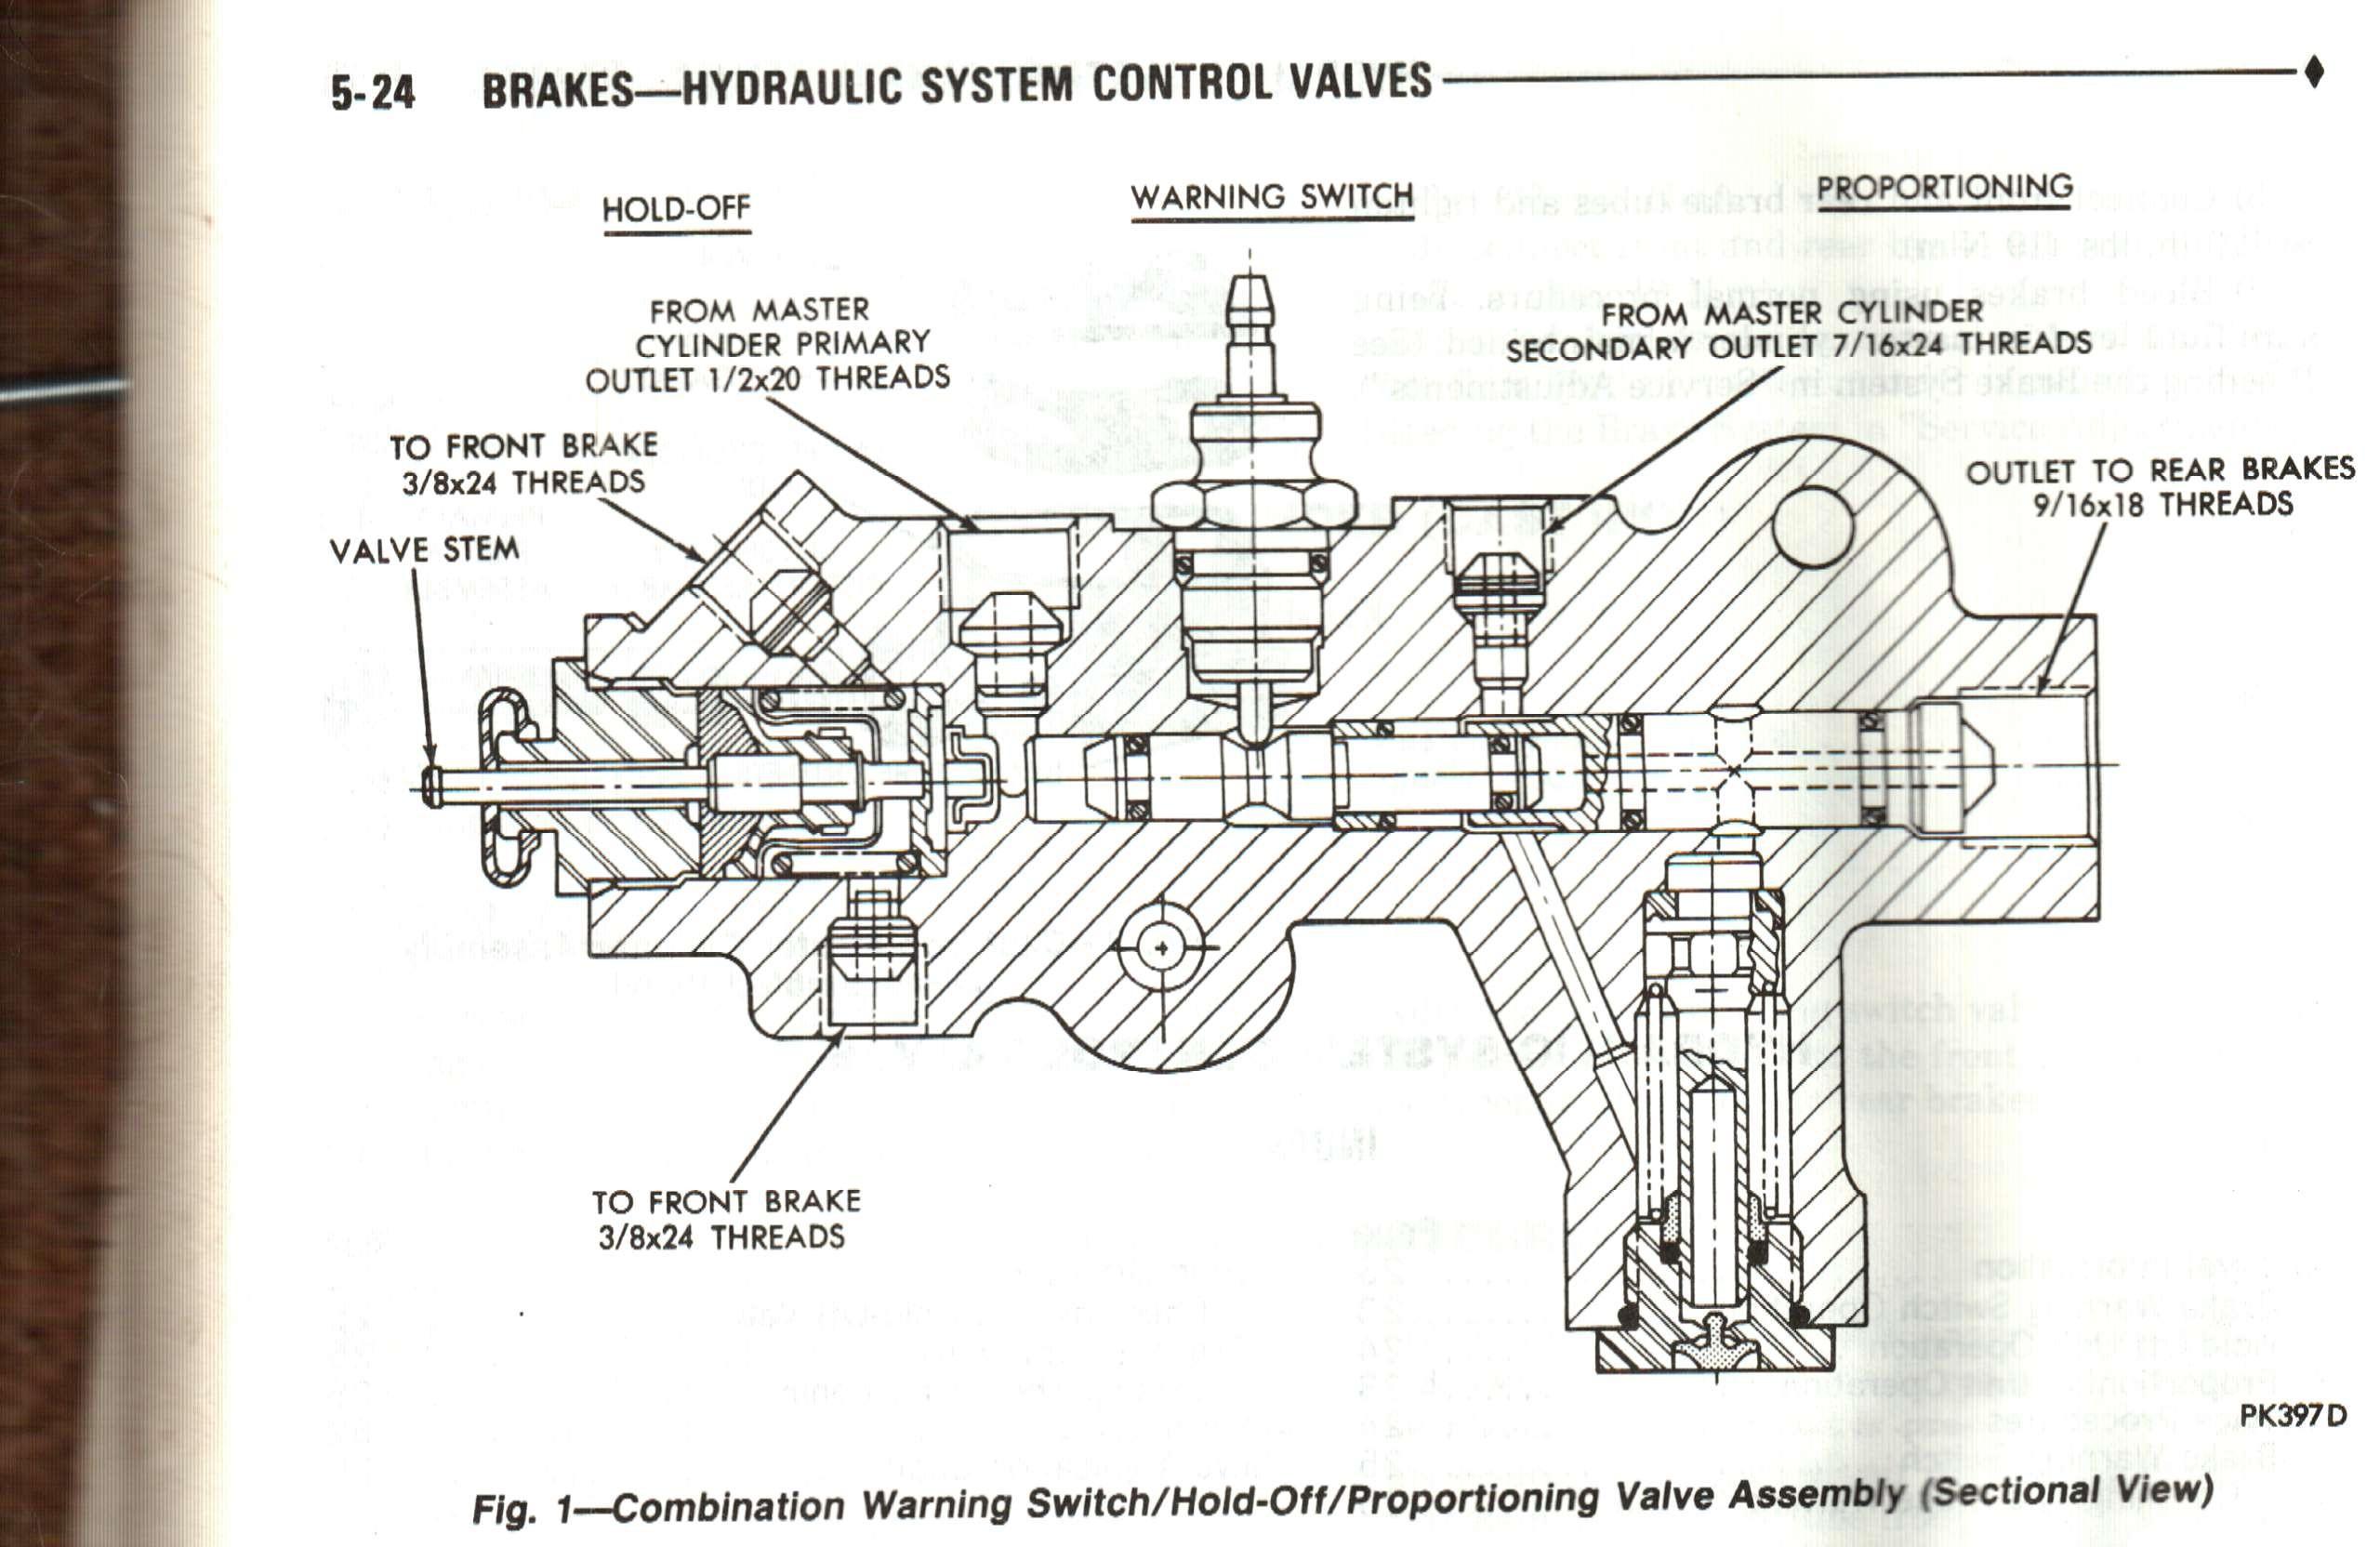 valve proportioning brake dodge diagram ram proportion jeep ramcharger durango mopar brakes gm cummins truck power wagon front w150 help